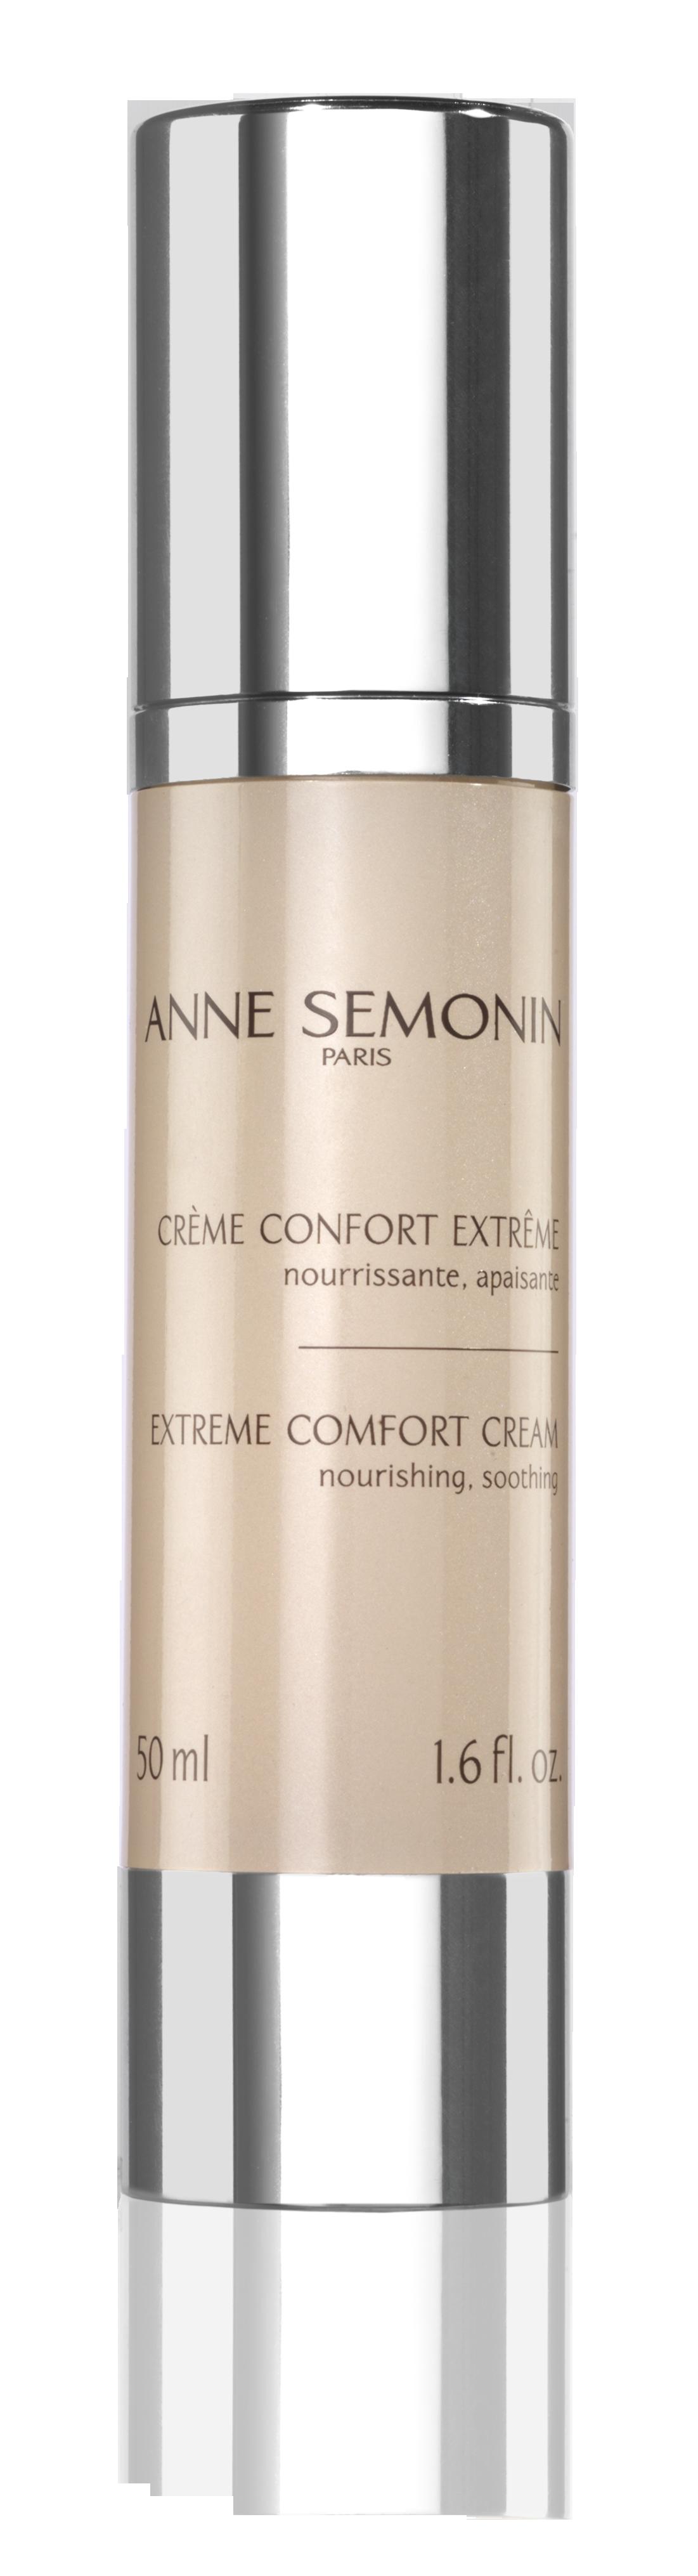 AS_Extreme_Comfort_Cream